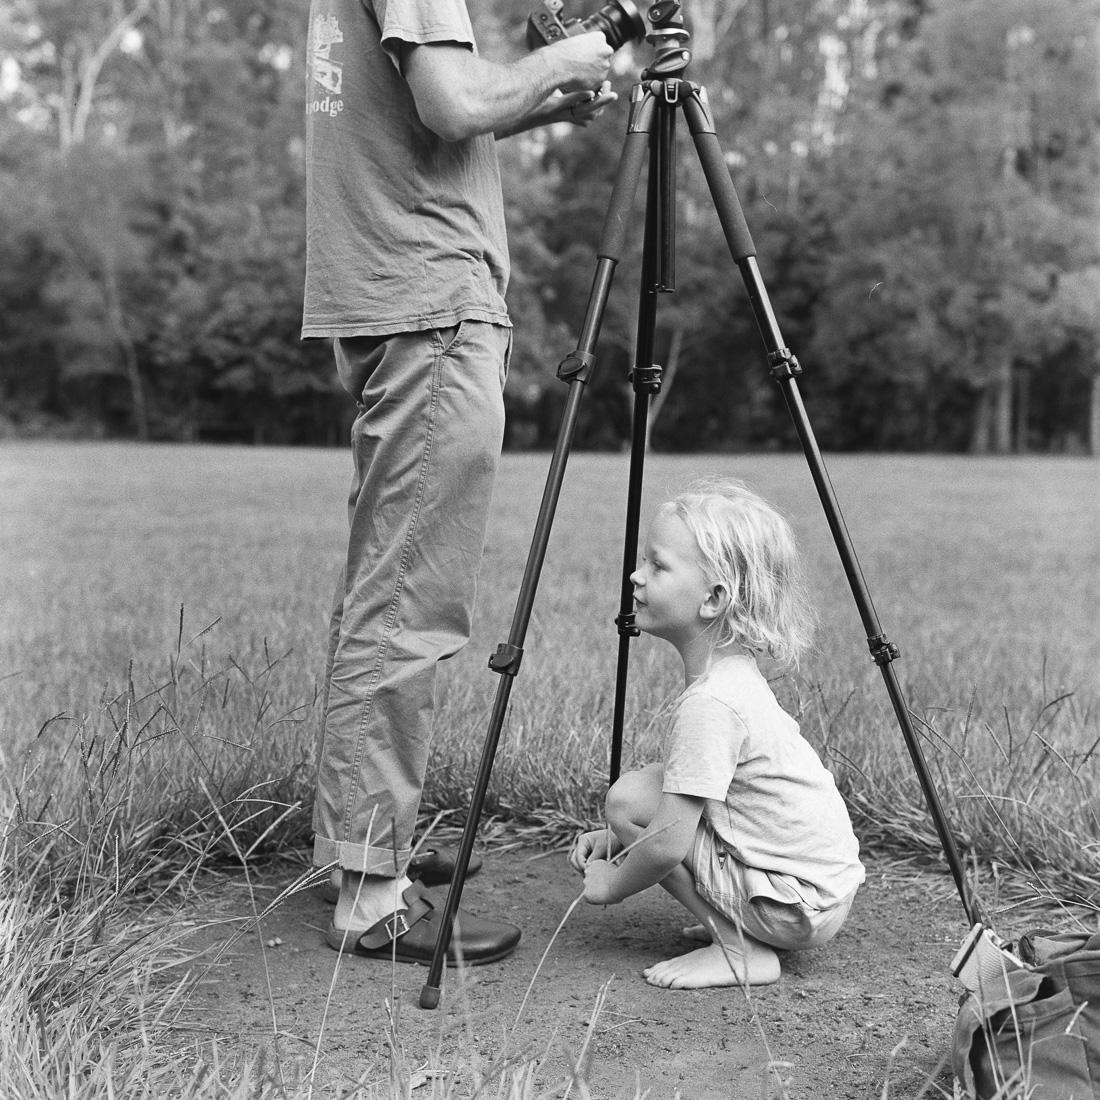 20190112 - Roll 270 - 002-Nick-Bedford,-Photographer-80mm F2.8, Black and White, Brisbane, Ilford HP5+, Medium Format, Rolleiflex 2.8D.jpg